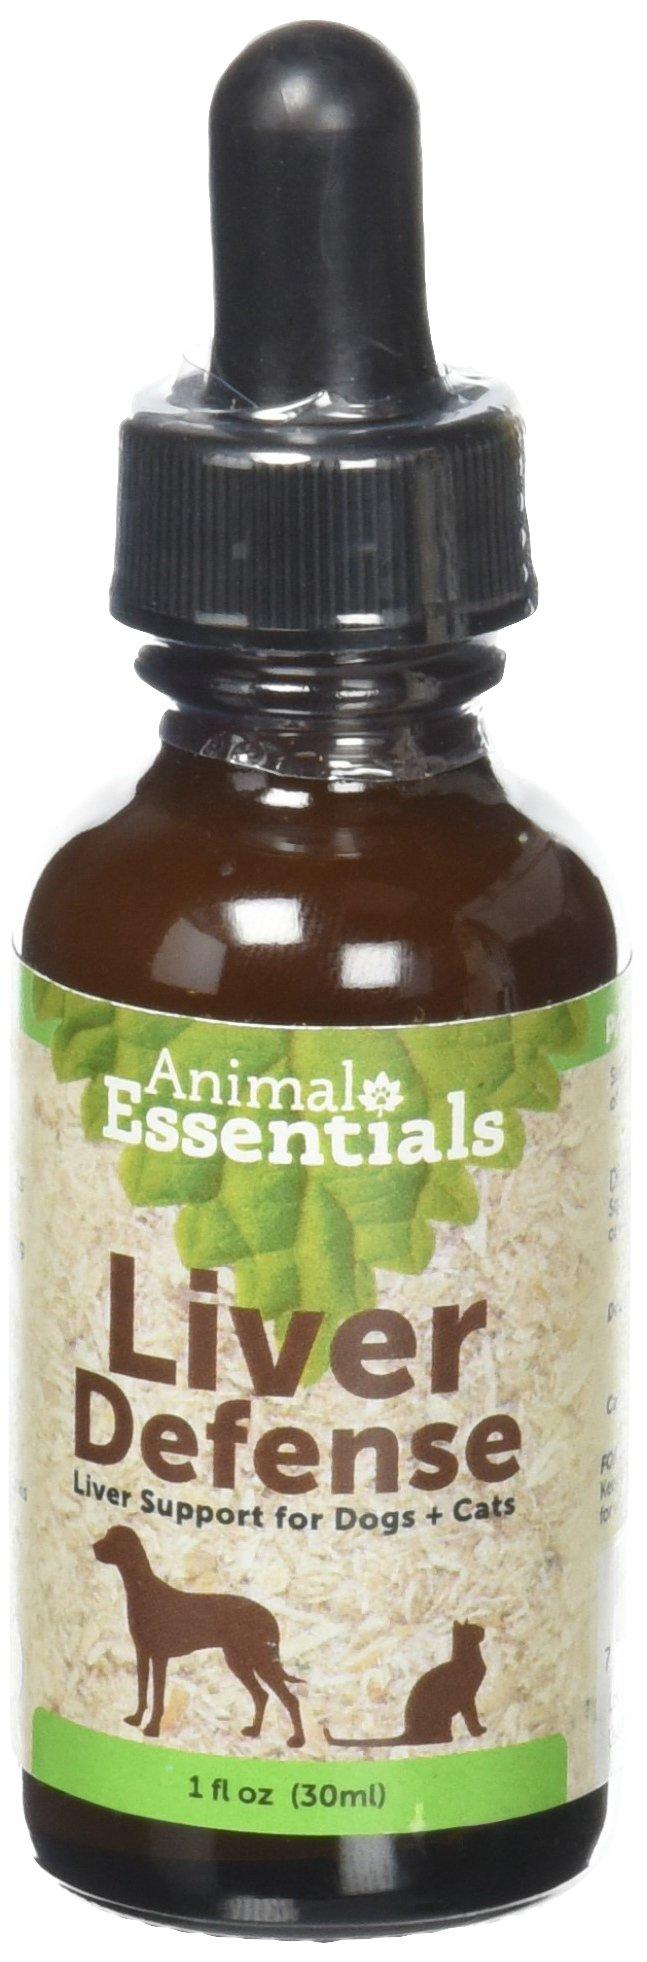 0ANIV Animal Essentials Liver Defense 1 fl oz